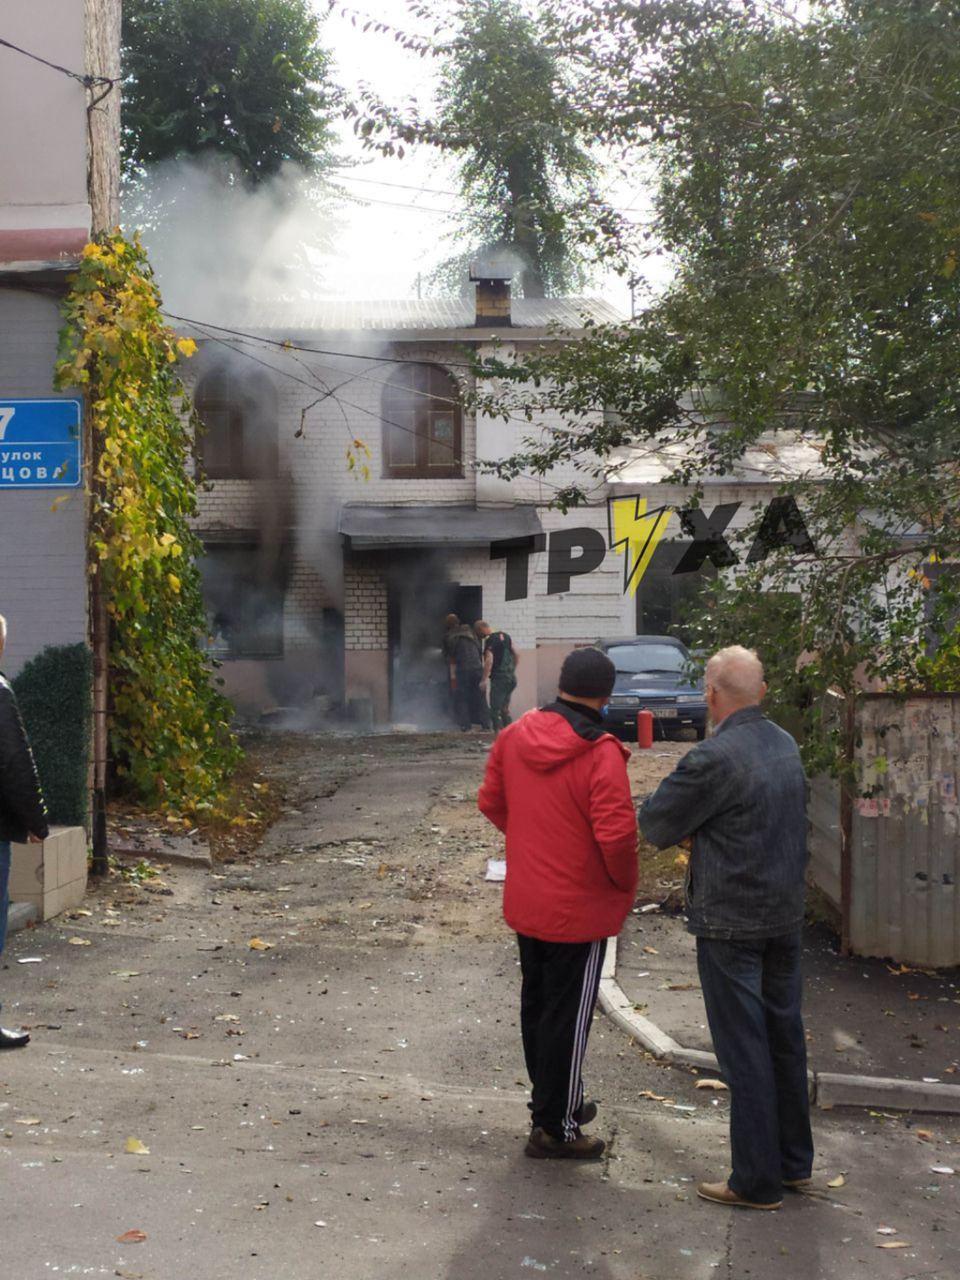 ЧП в центе Харькова